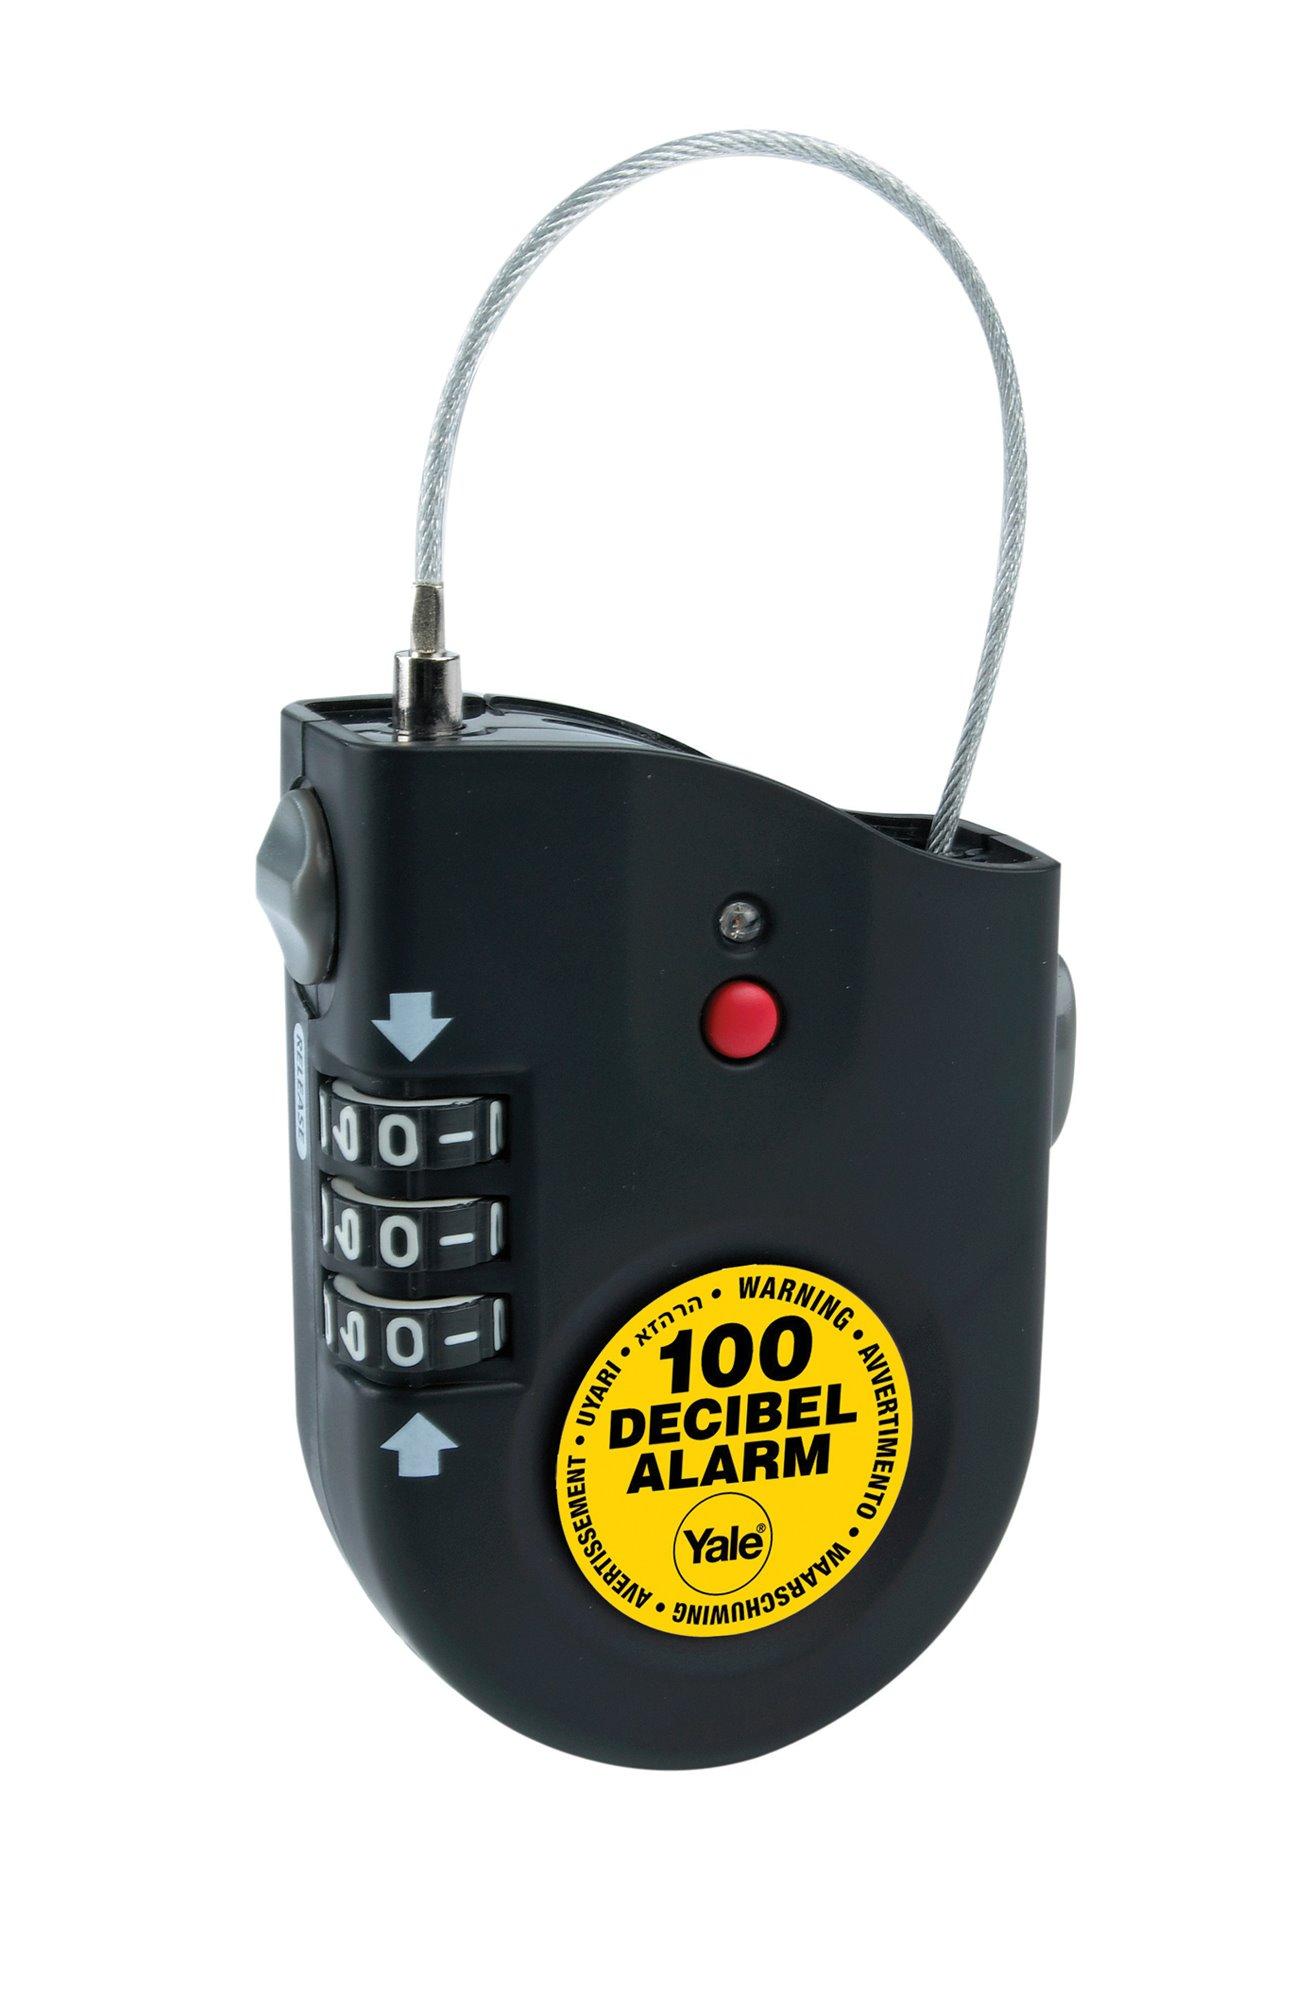 YCL1/2/ALARM - Lock Alarm Mini